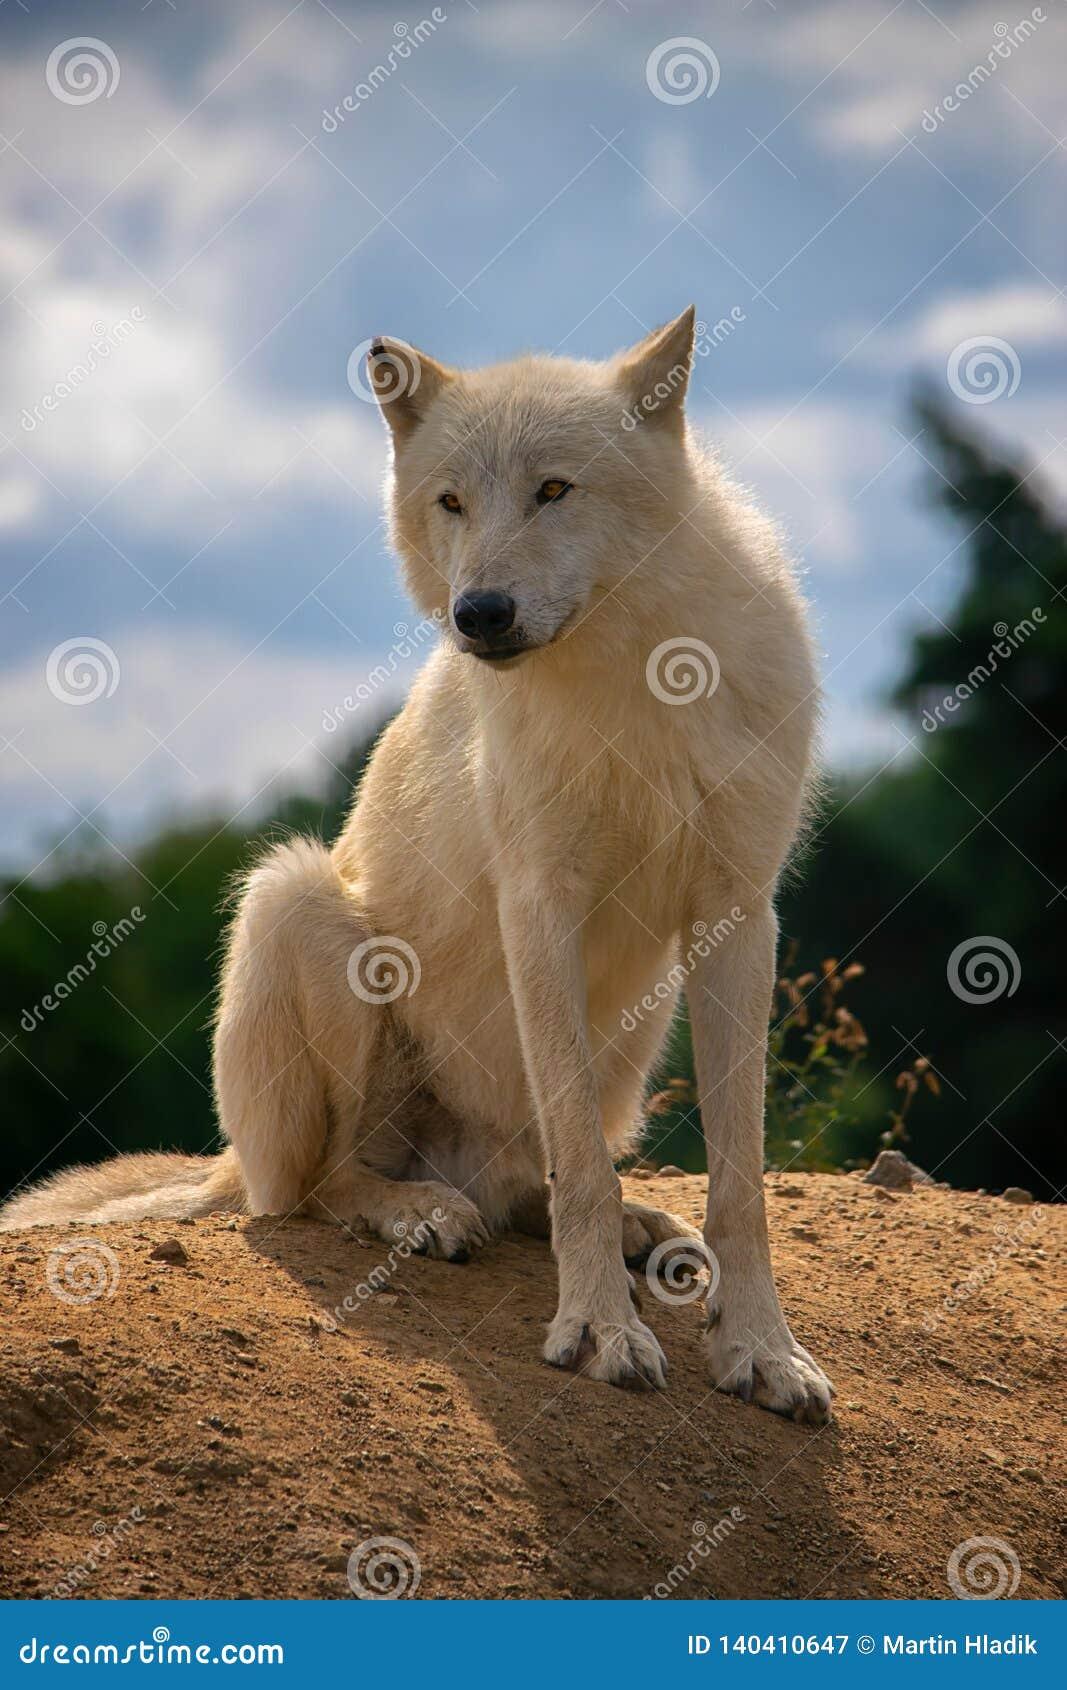 Arctic wolf, mammal, postrait, dog